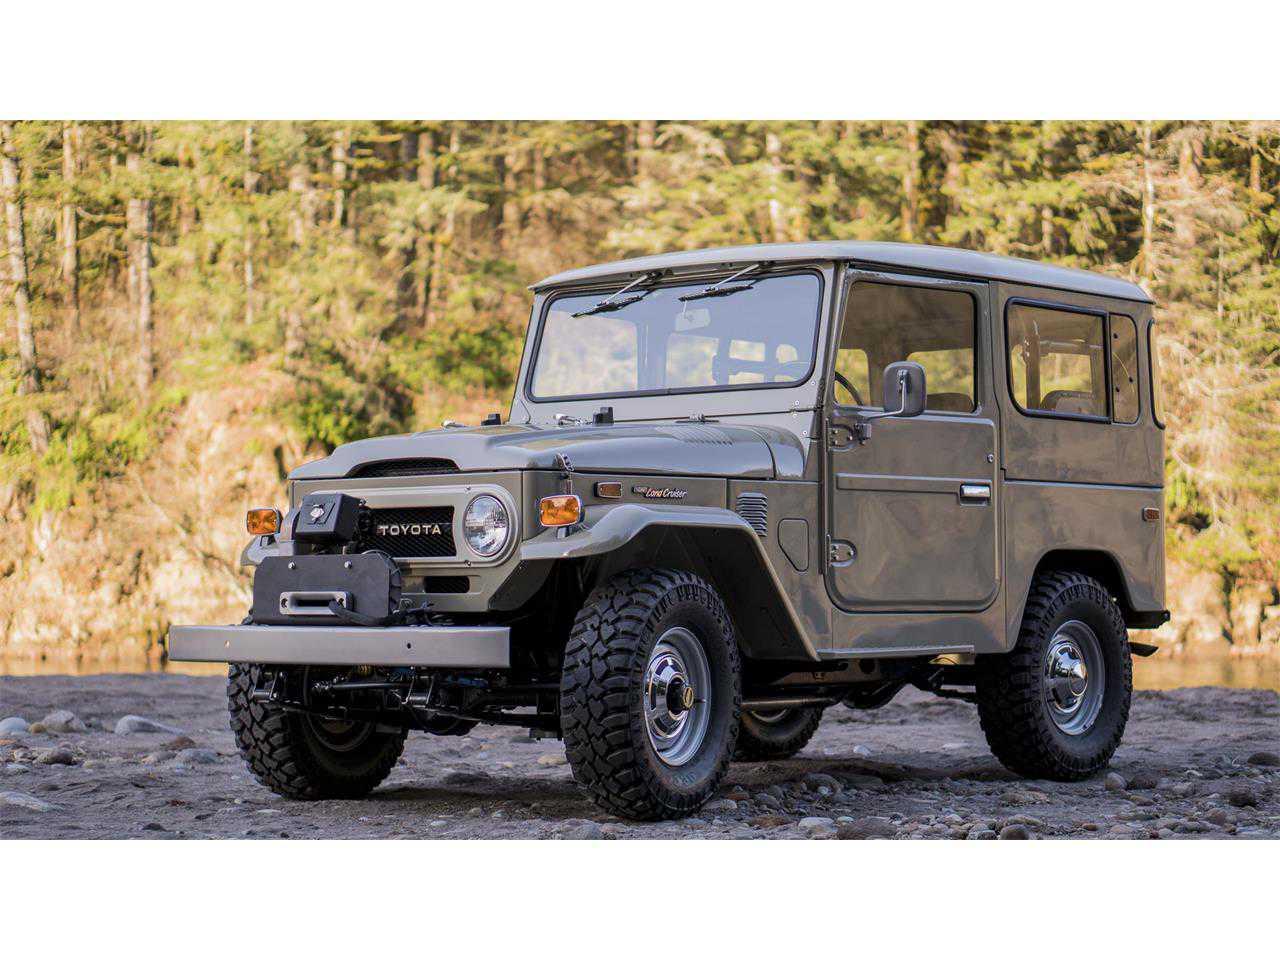 1974 Toyota Land Cruiser Fj40 For Sale In Fj40167204 1990